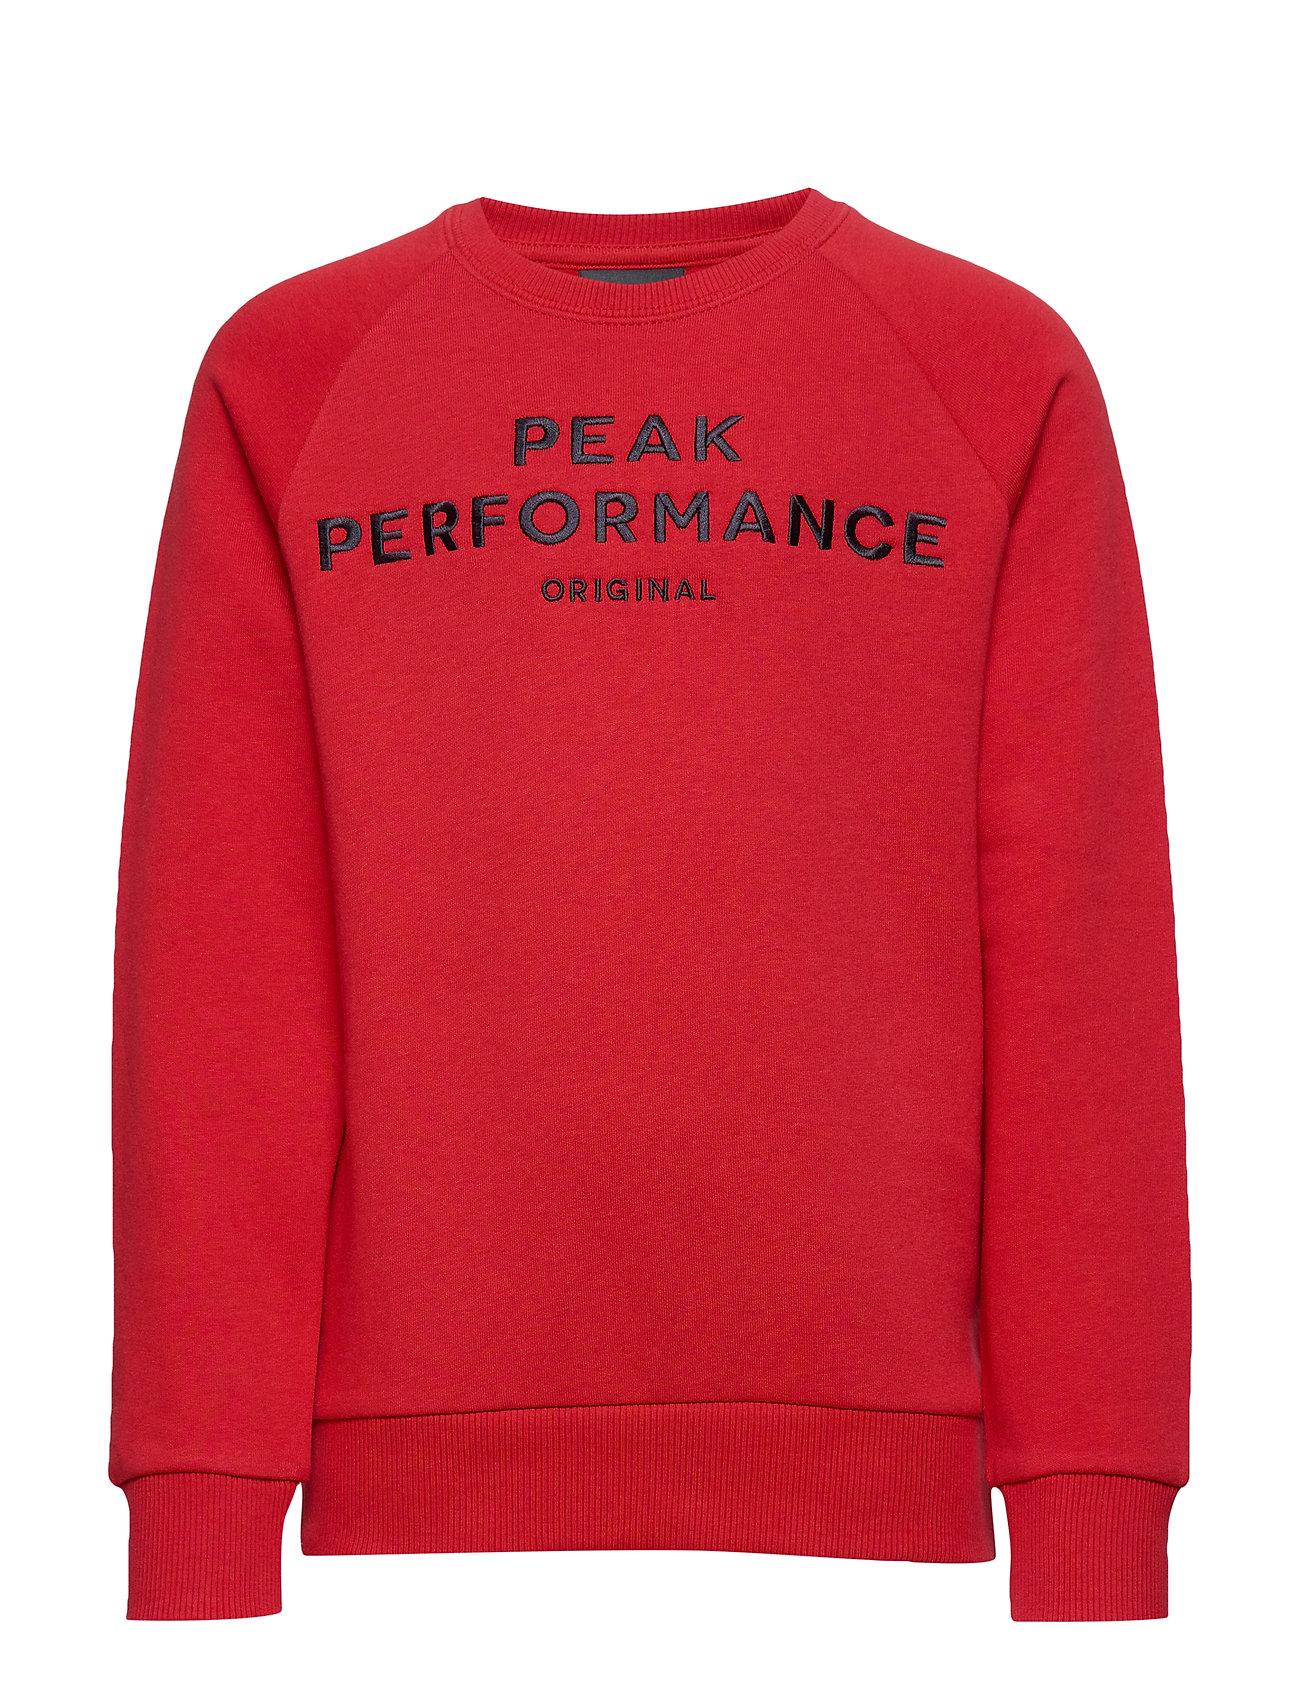 Peak Performance JR ORIGC - DARK CHILLI